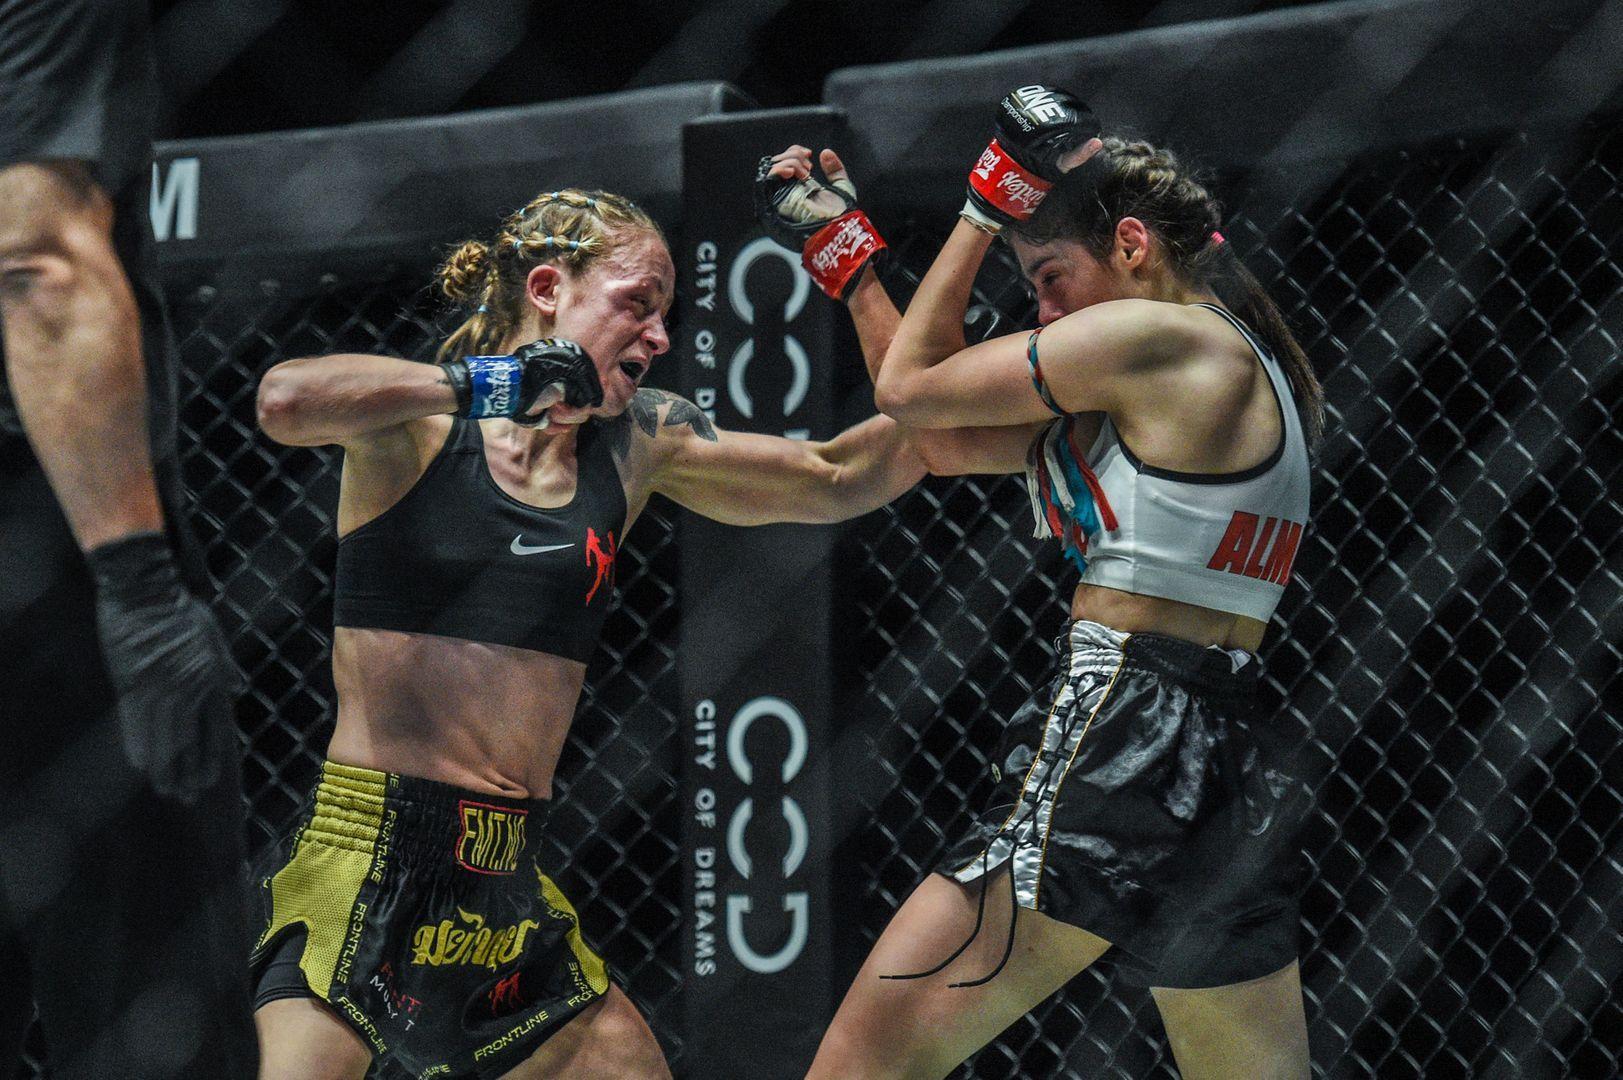 Norway's Anne Line Hogstad punches Australia's Alma Juniku